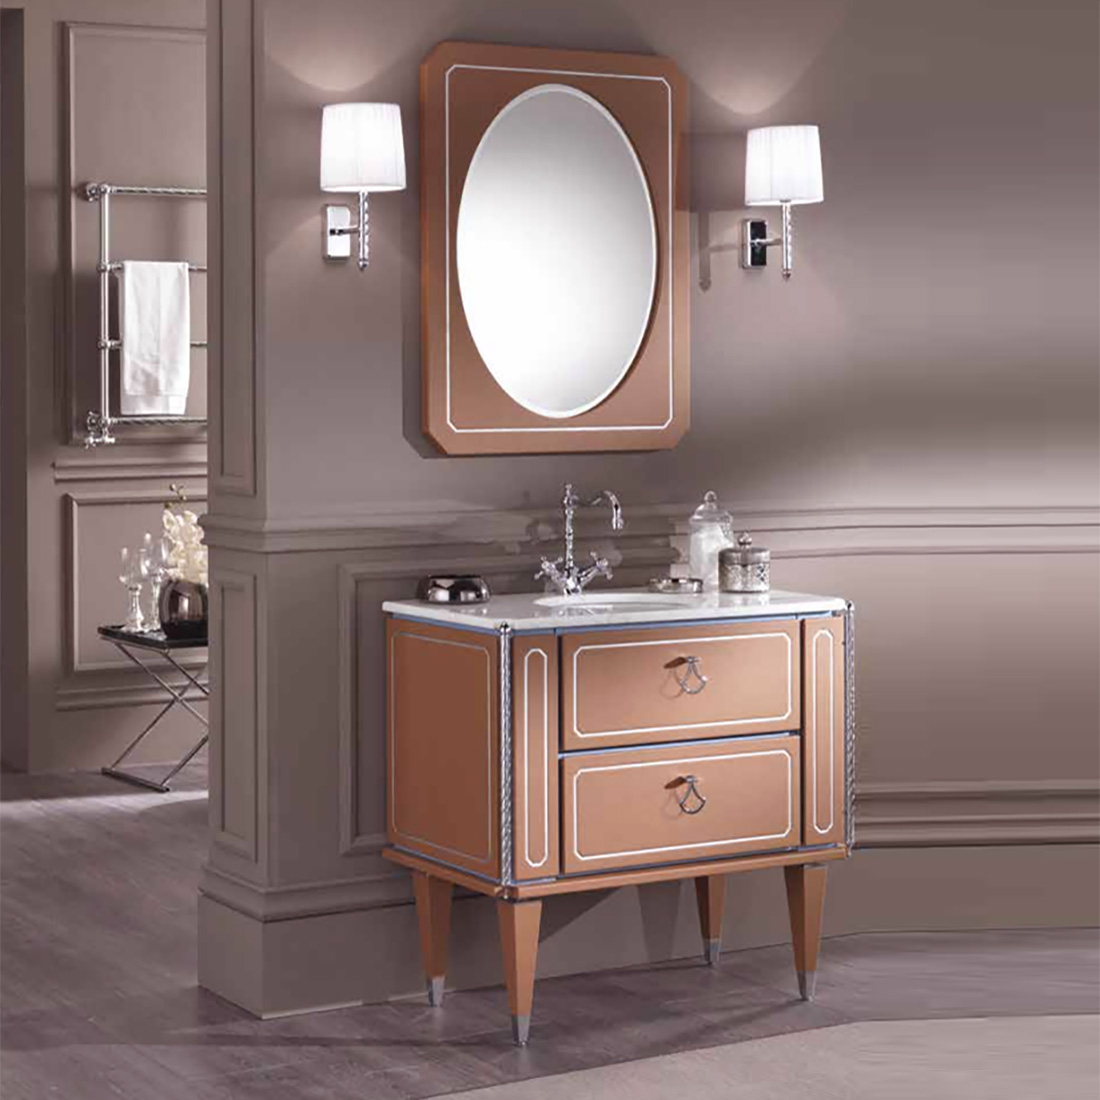 Mia Italia Petit 03 36 Inch Unique Bathroom Vanity Color Red Brown